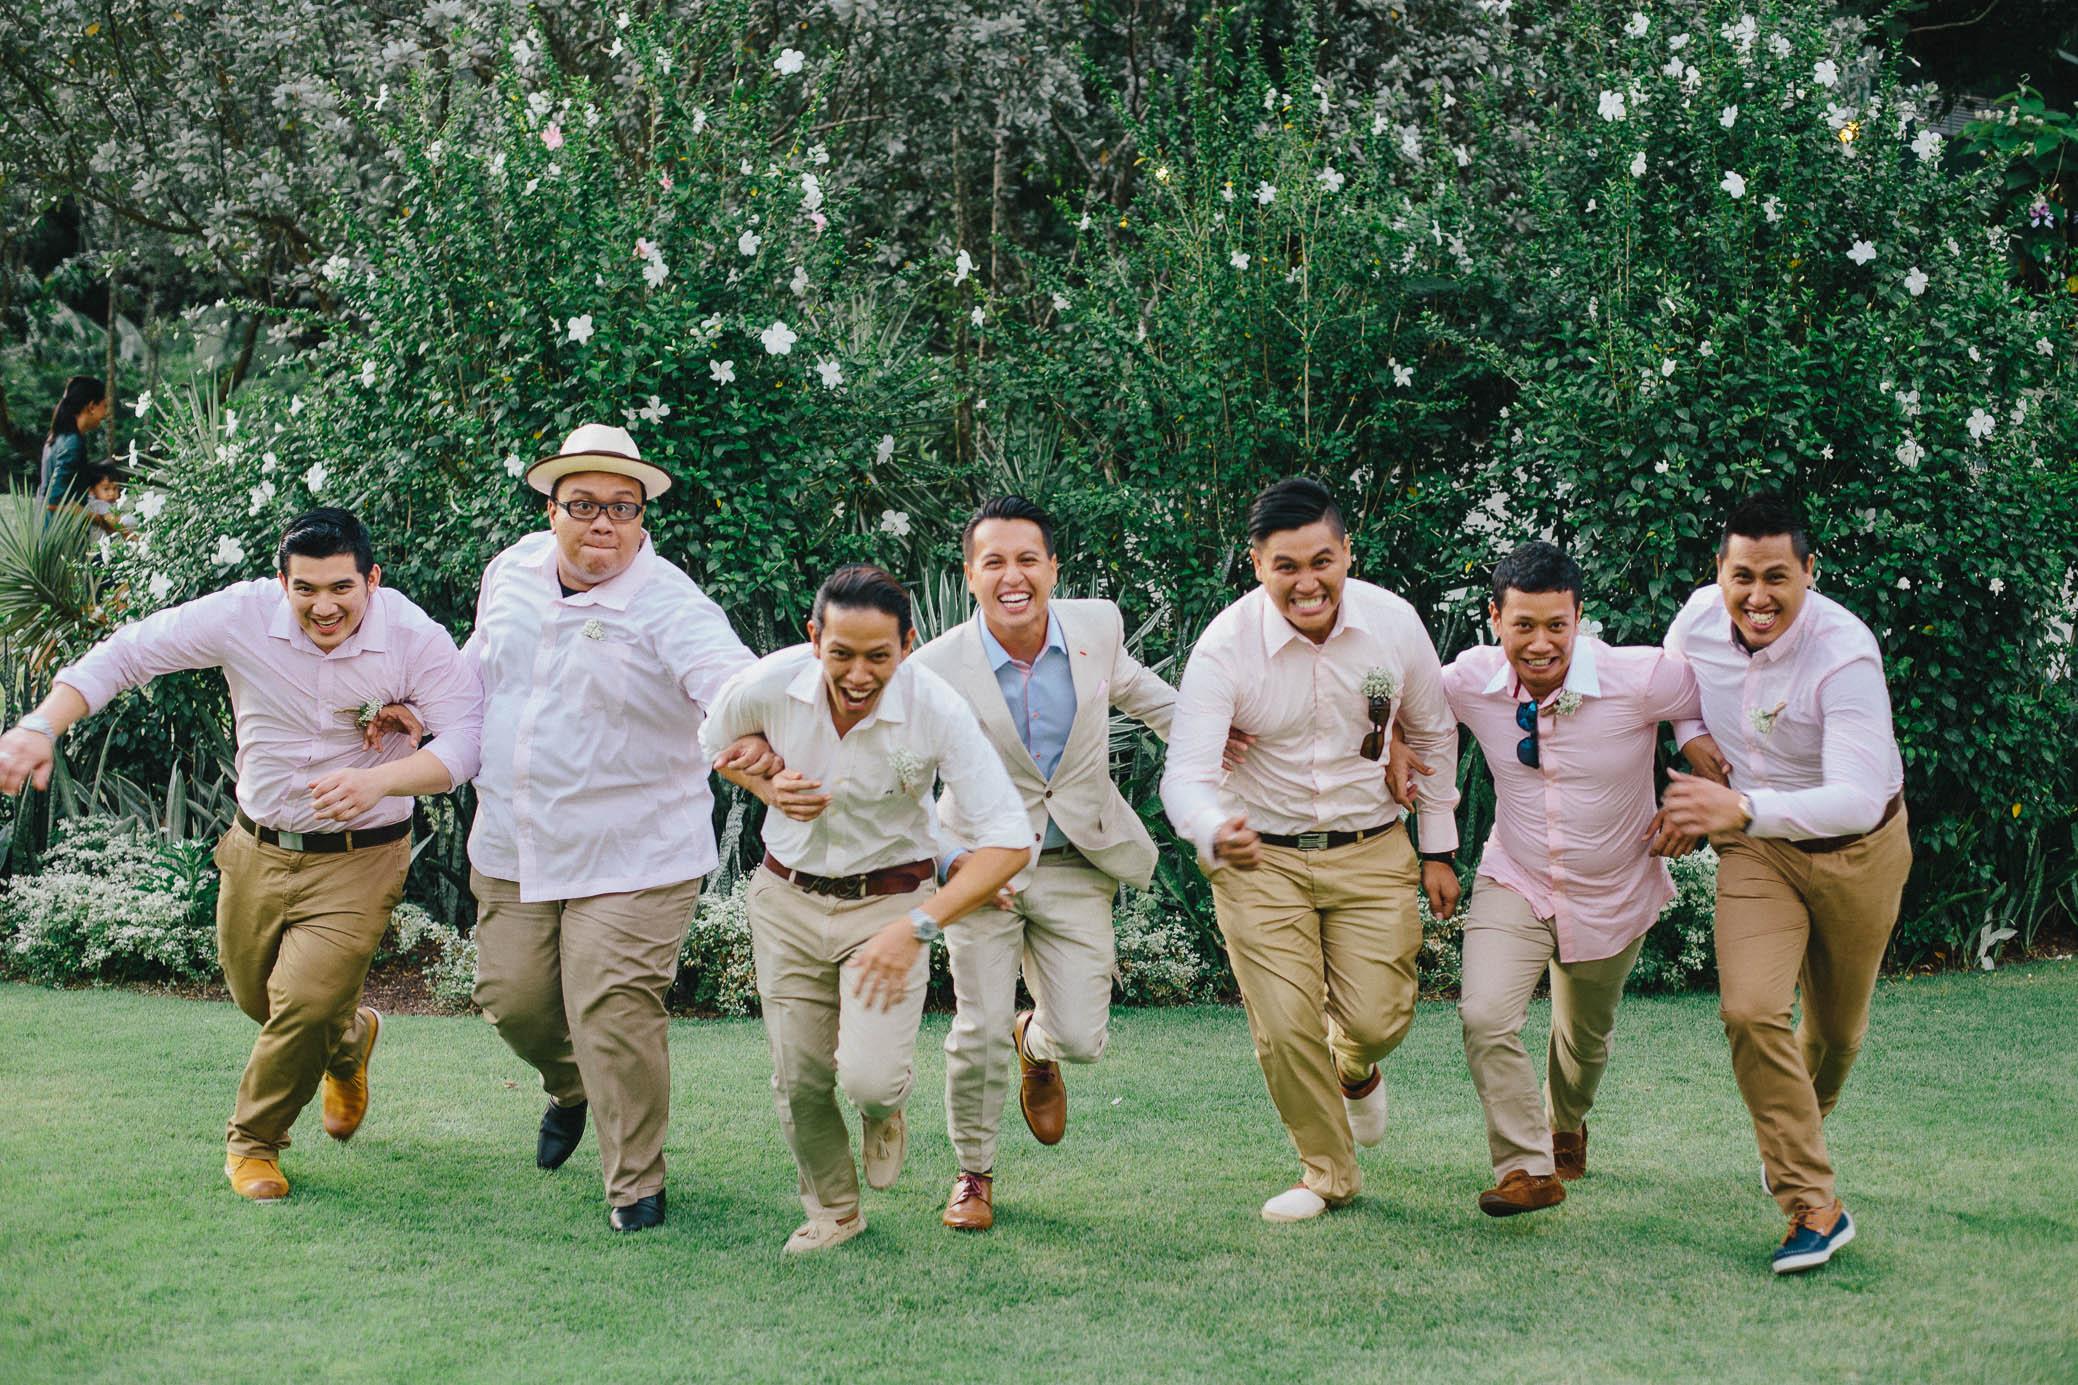 singapore-wedding-photographer-malay-indian-pre-wedding-travel-wmt-2015-83.jpg